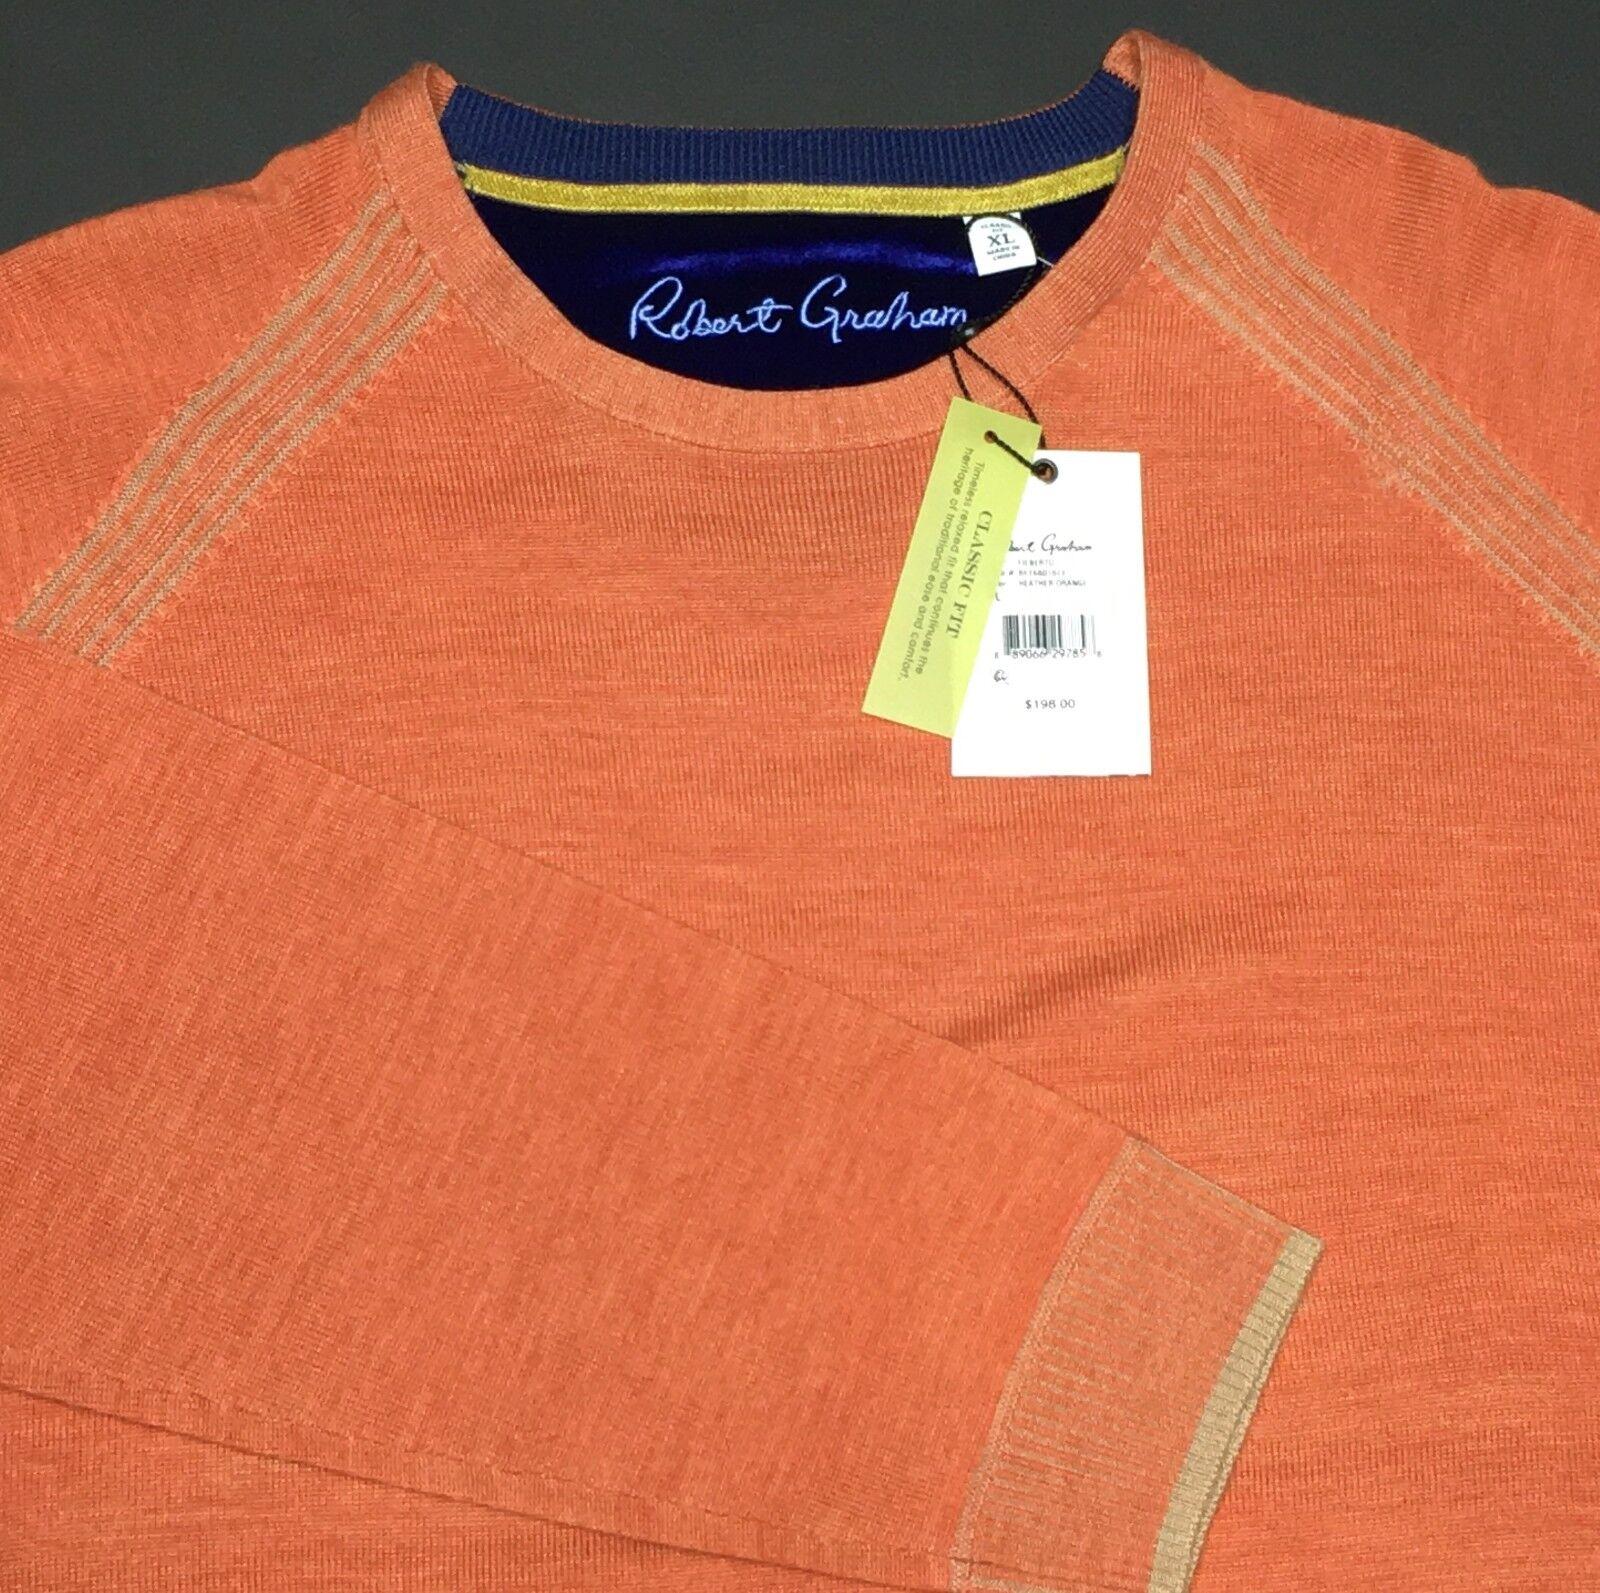 New Robert Graham Sweater  Herren XL Orange 100% Wool Soft Pullover Crew 198